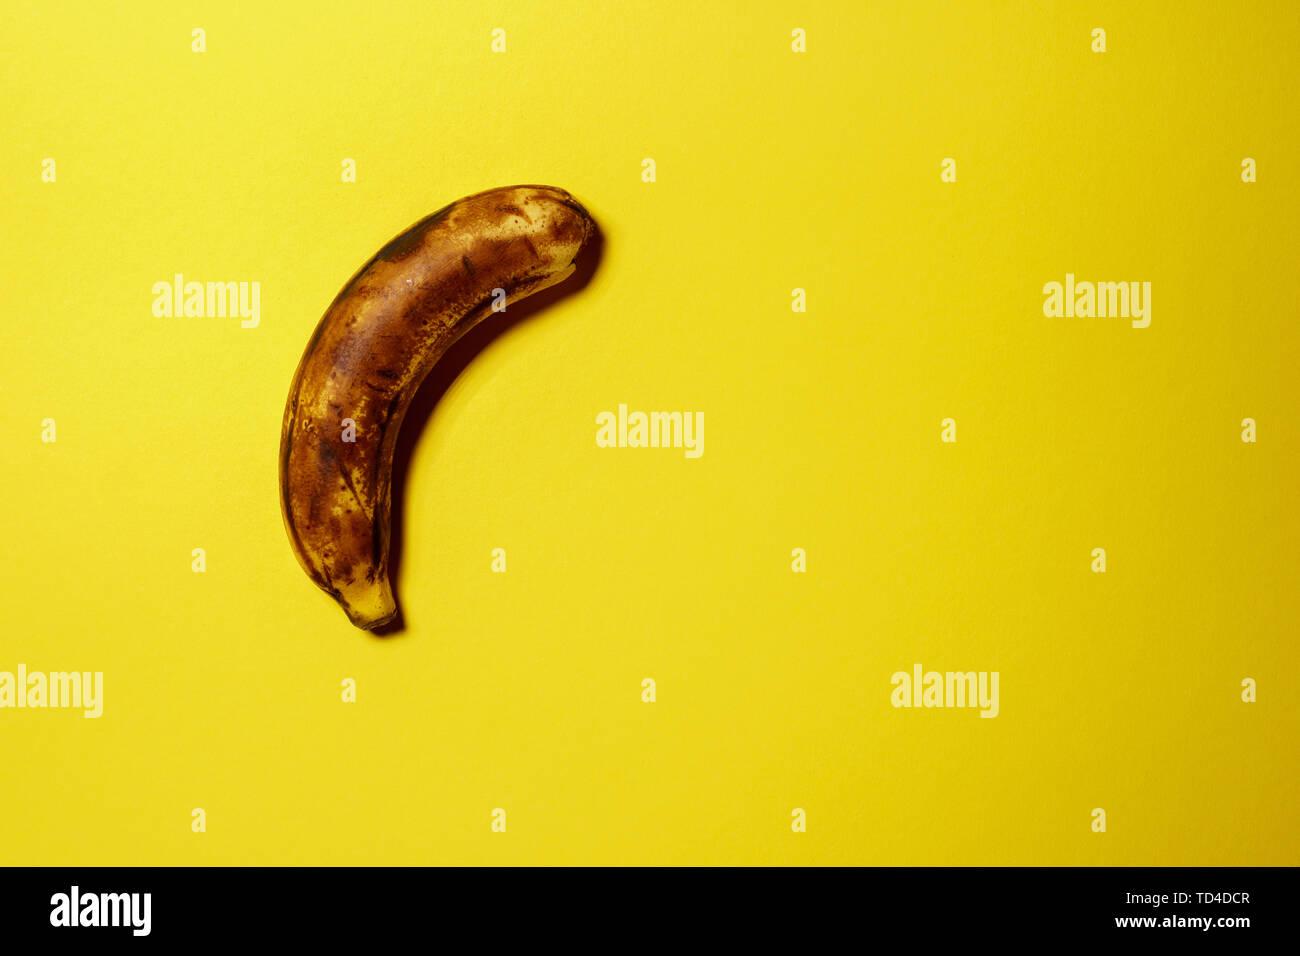 Single old rotten banana isolated on yellow background - Stock Image